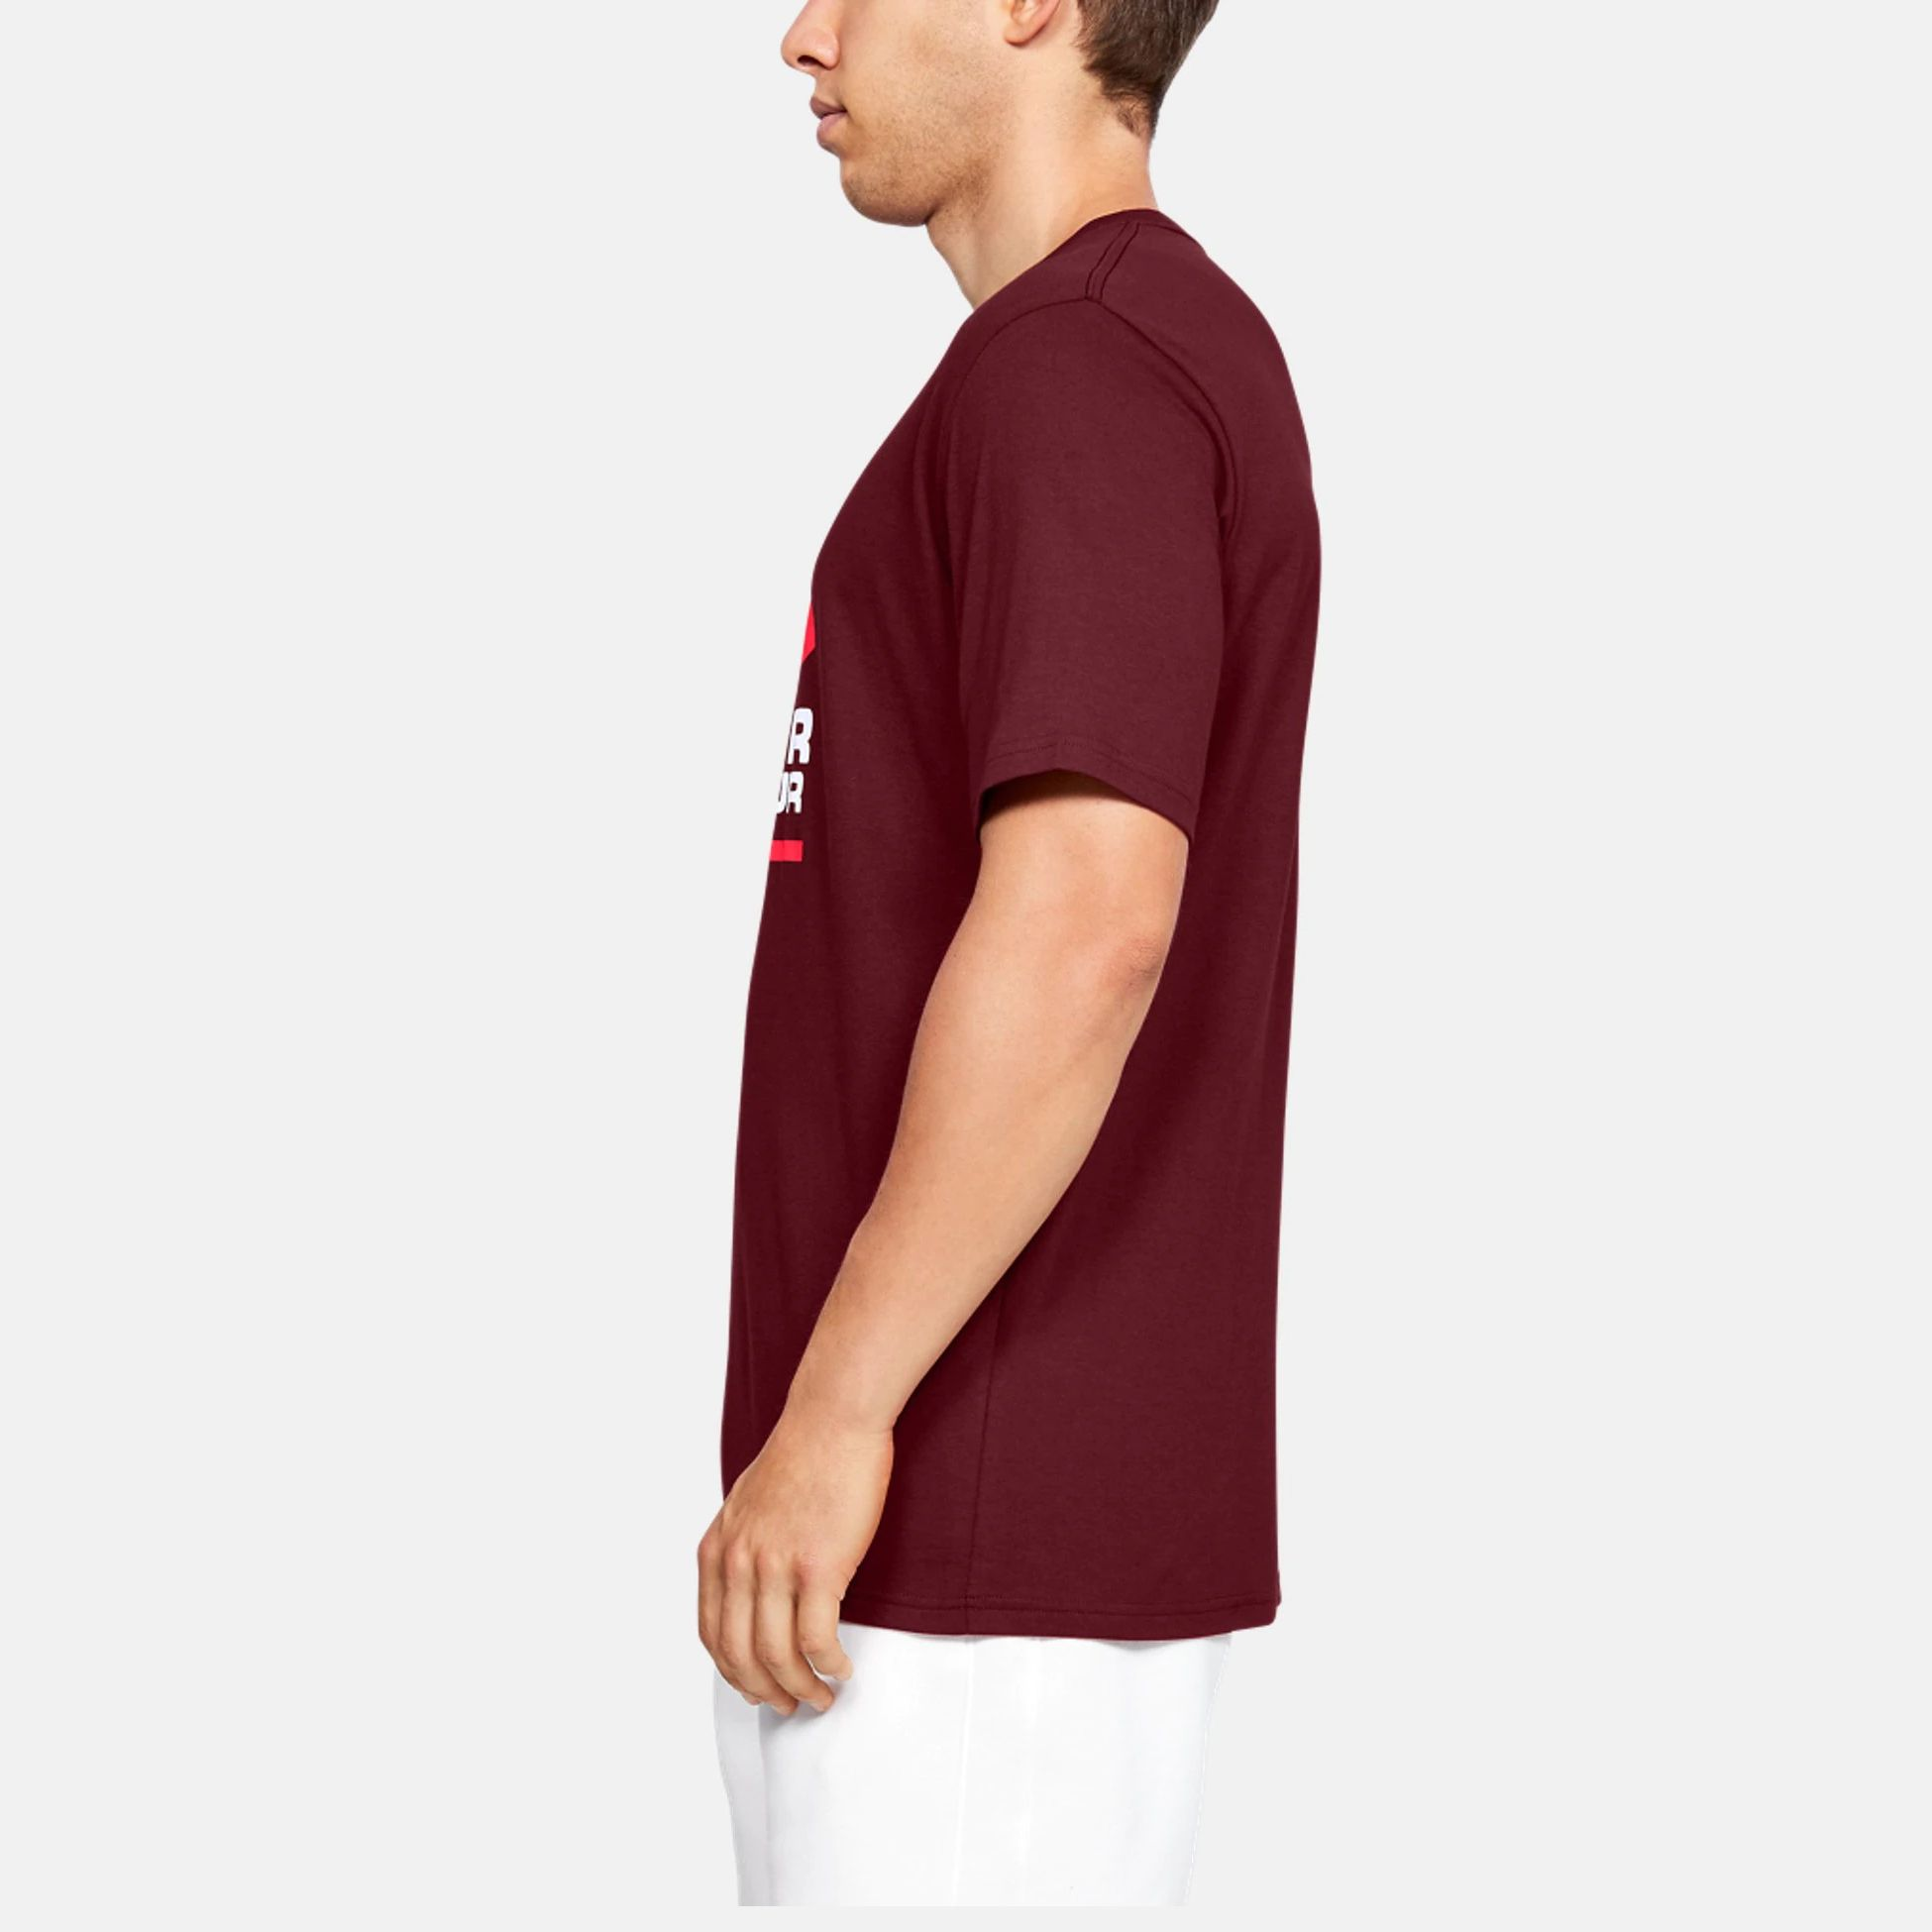 Clothing -  under armour GL Foundation Short Sleeve T-Shirt 6849